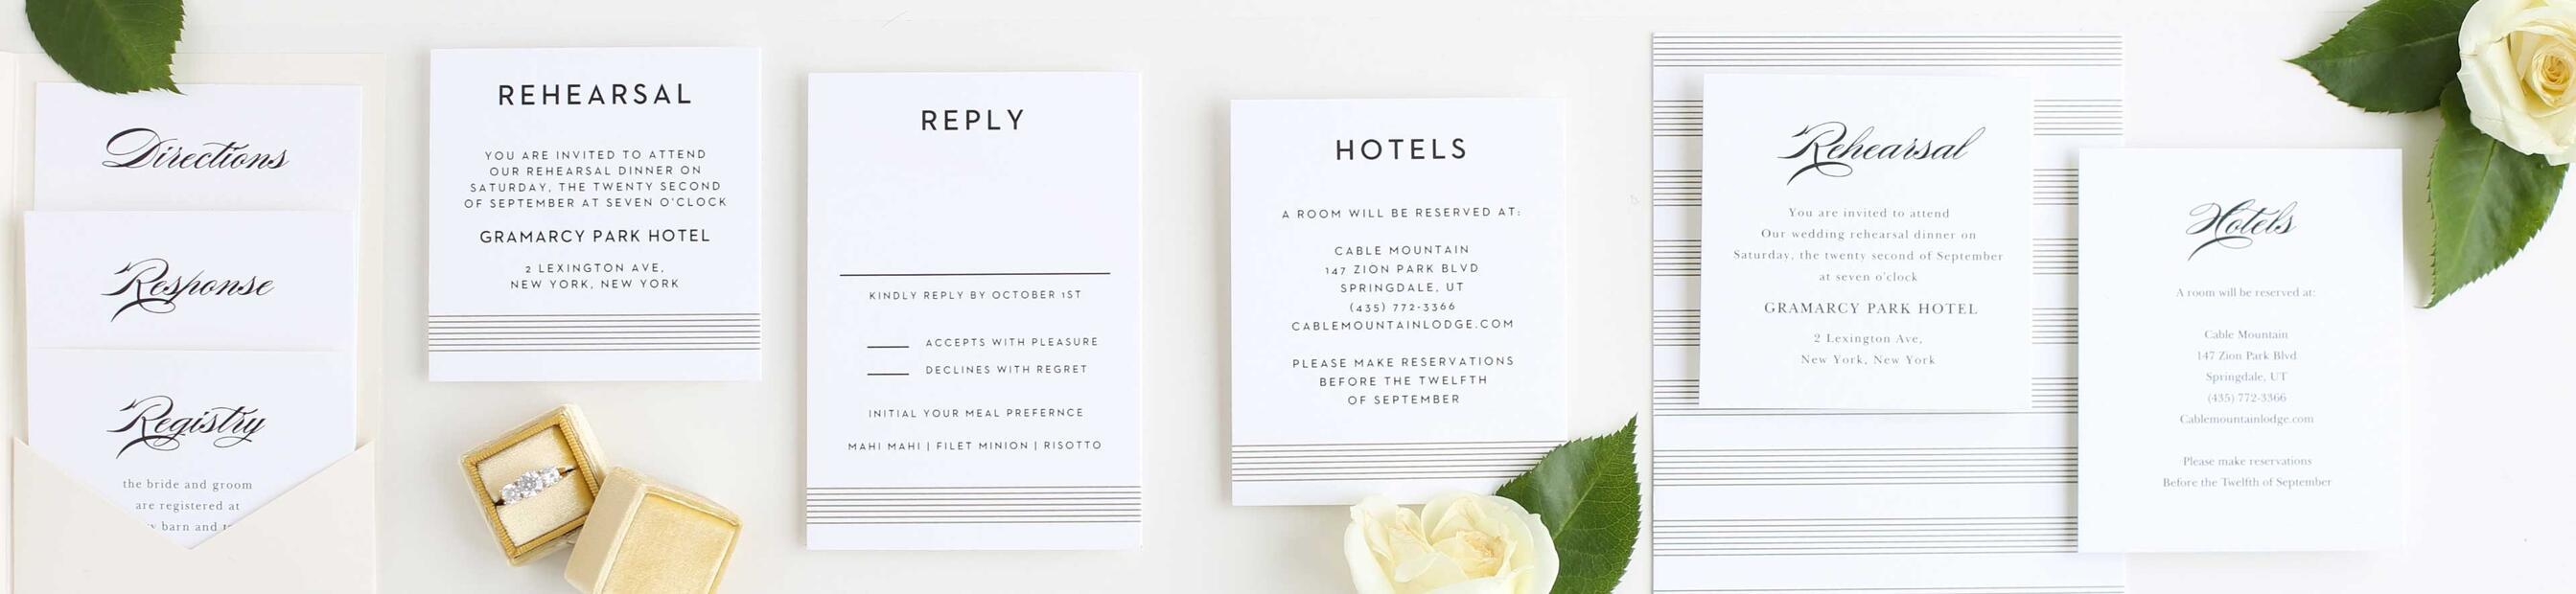 Wedding Enclosure Cards by Basic Invite, Photos 3+ Photos